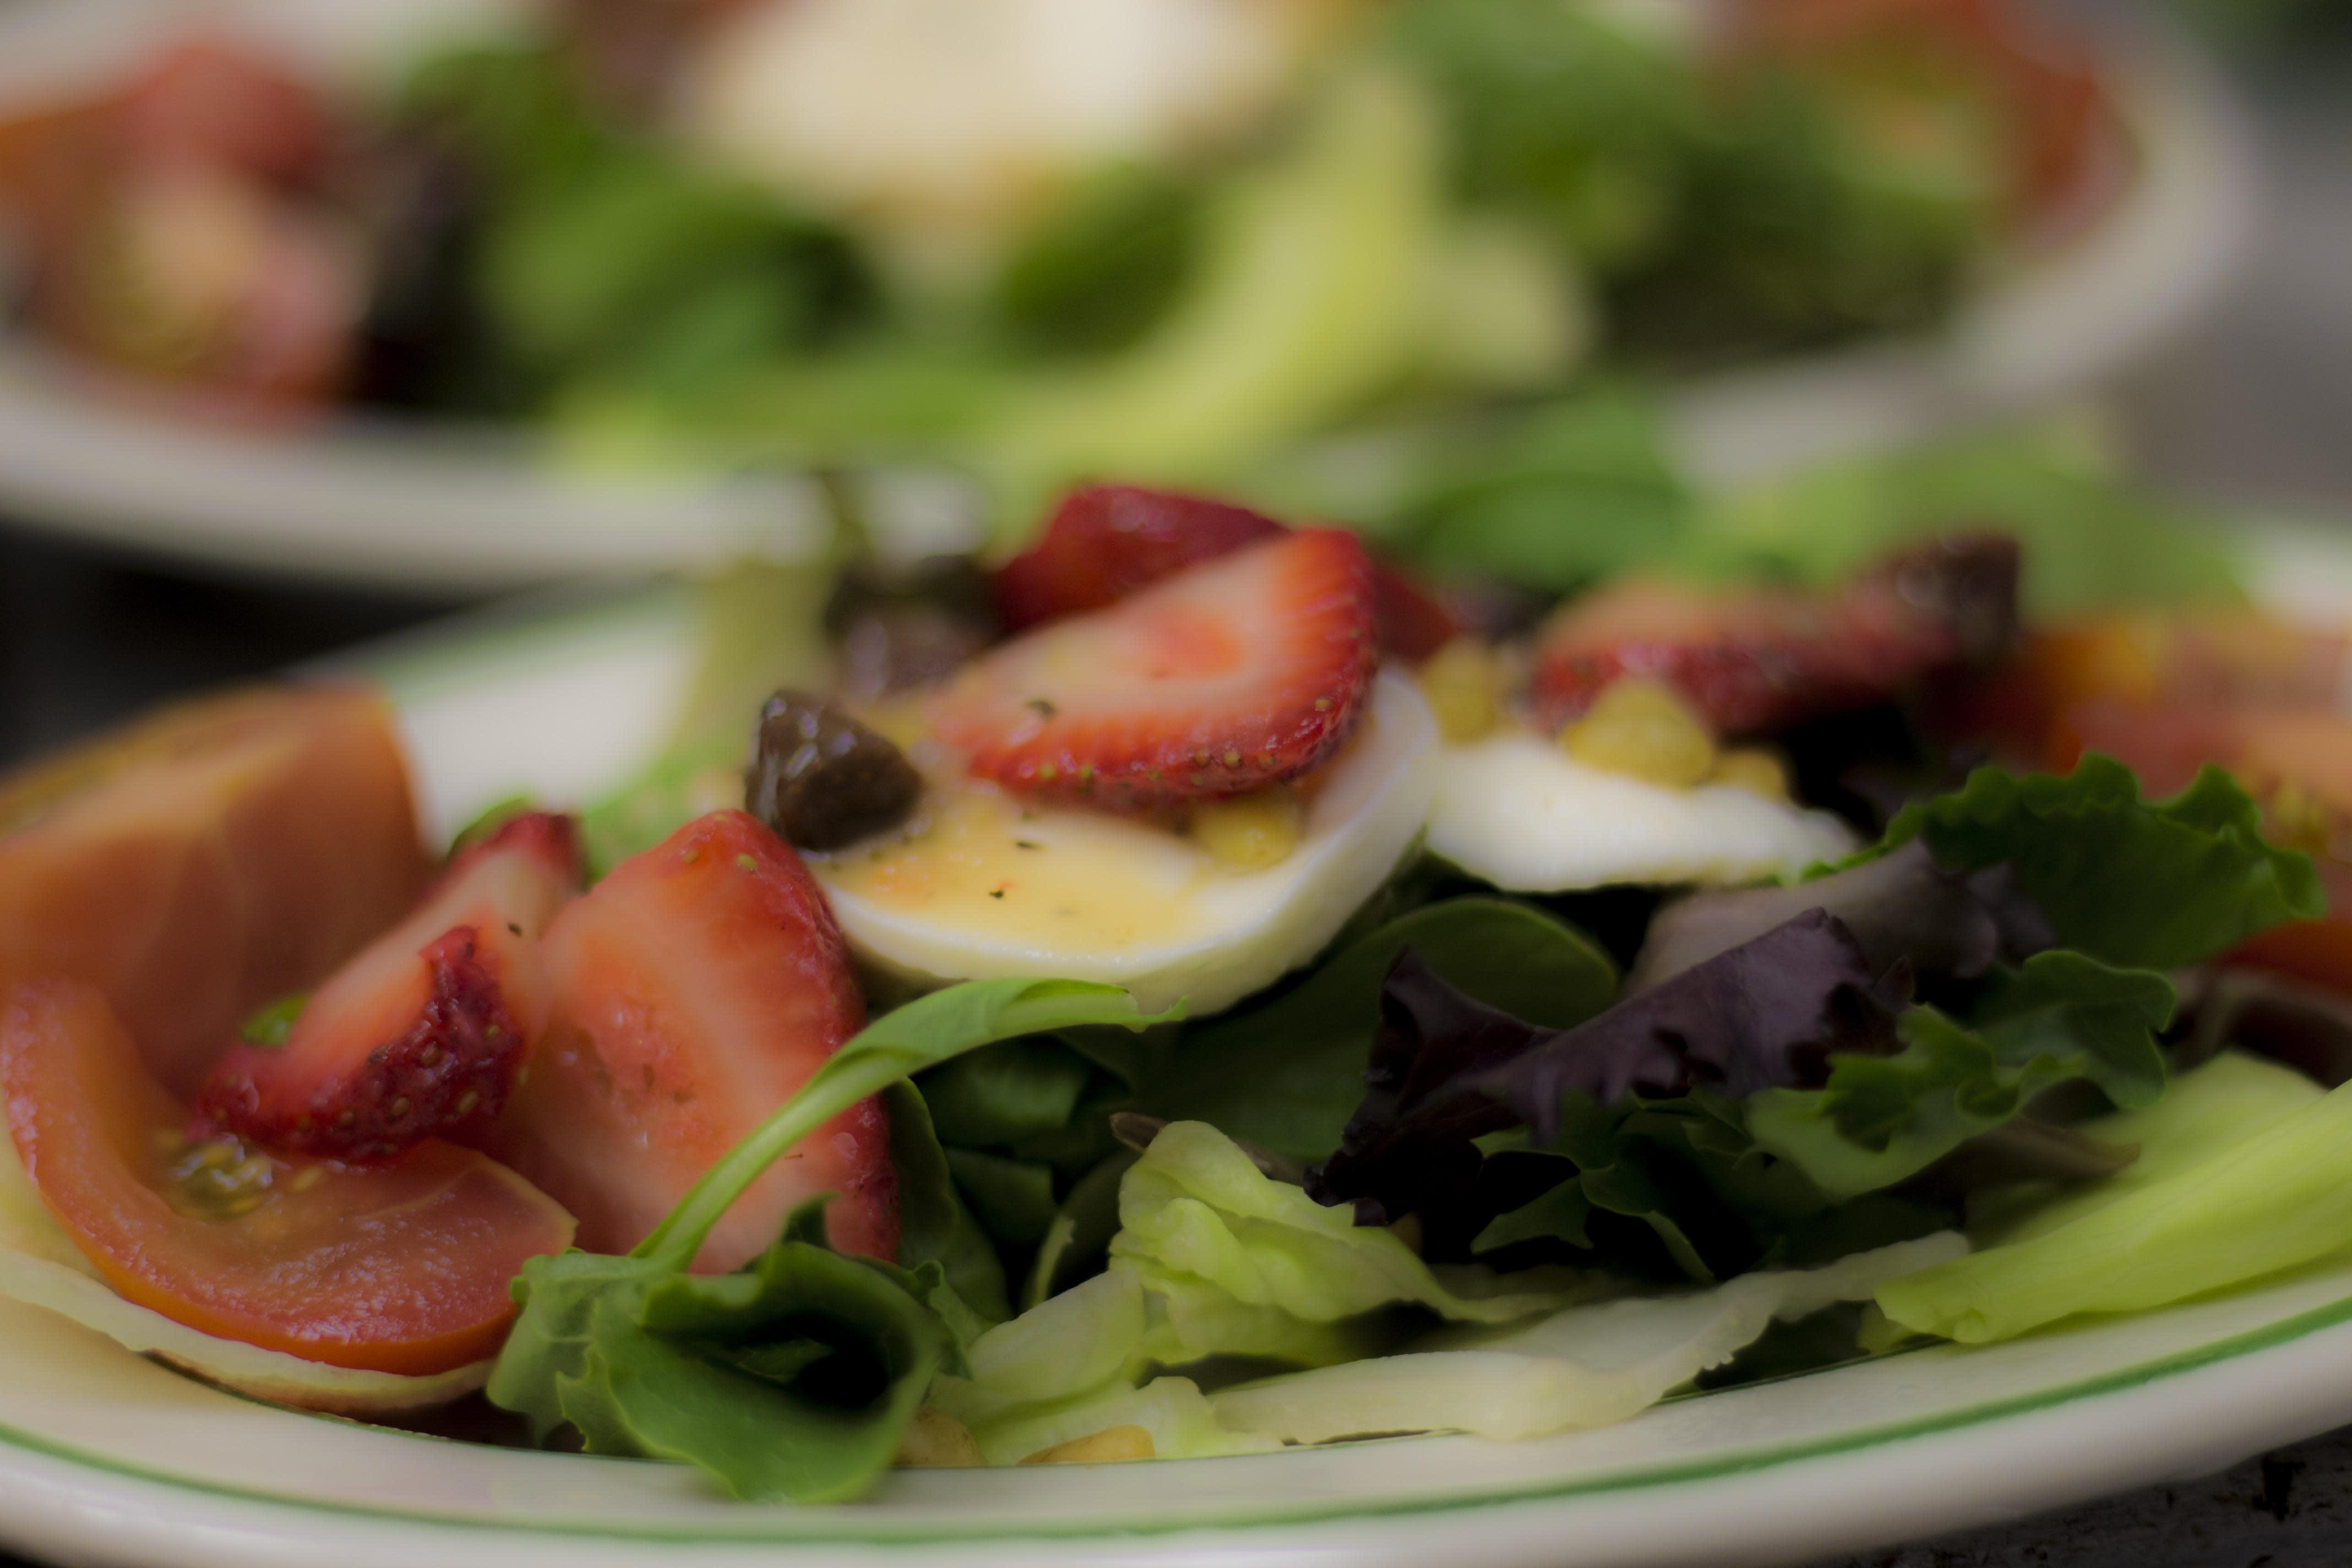 Spring Salad at Birraporetti's